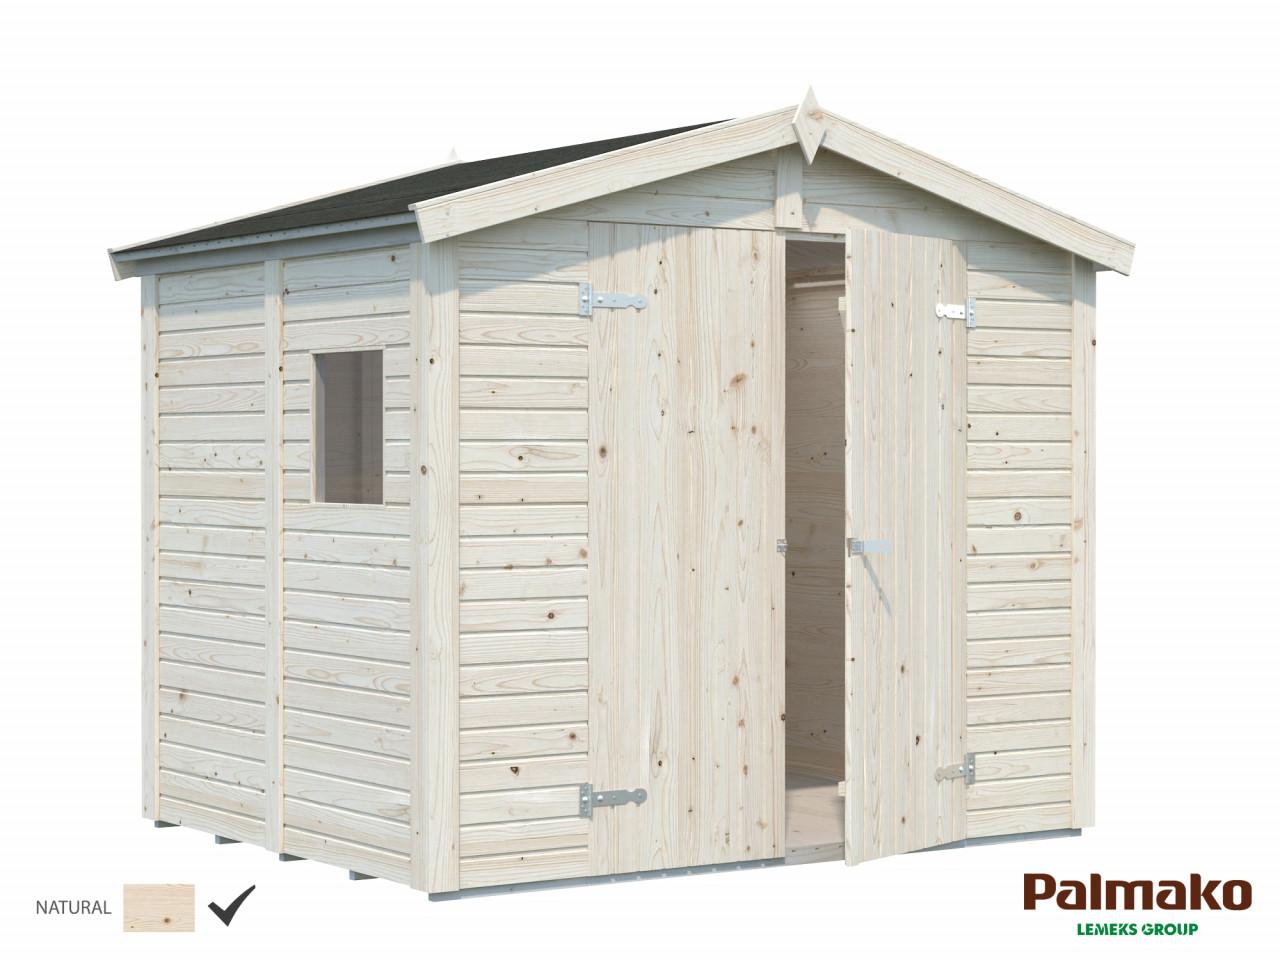 Palmako Gerätehaus Dan 4,5 m²